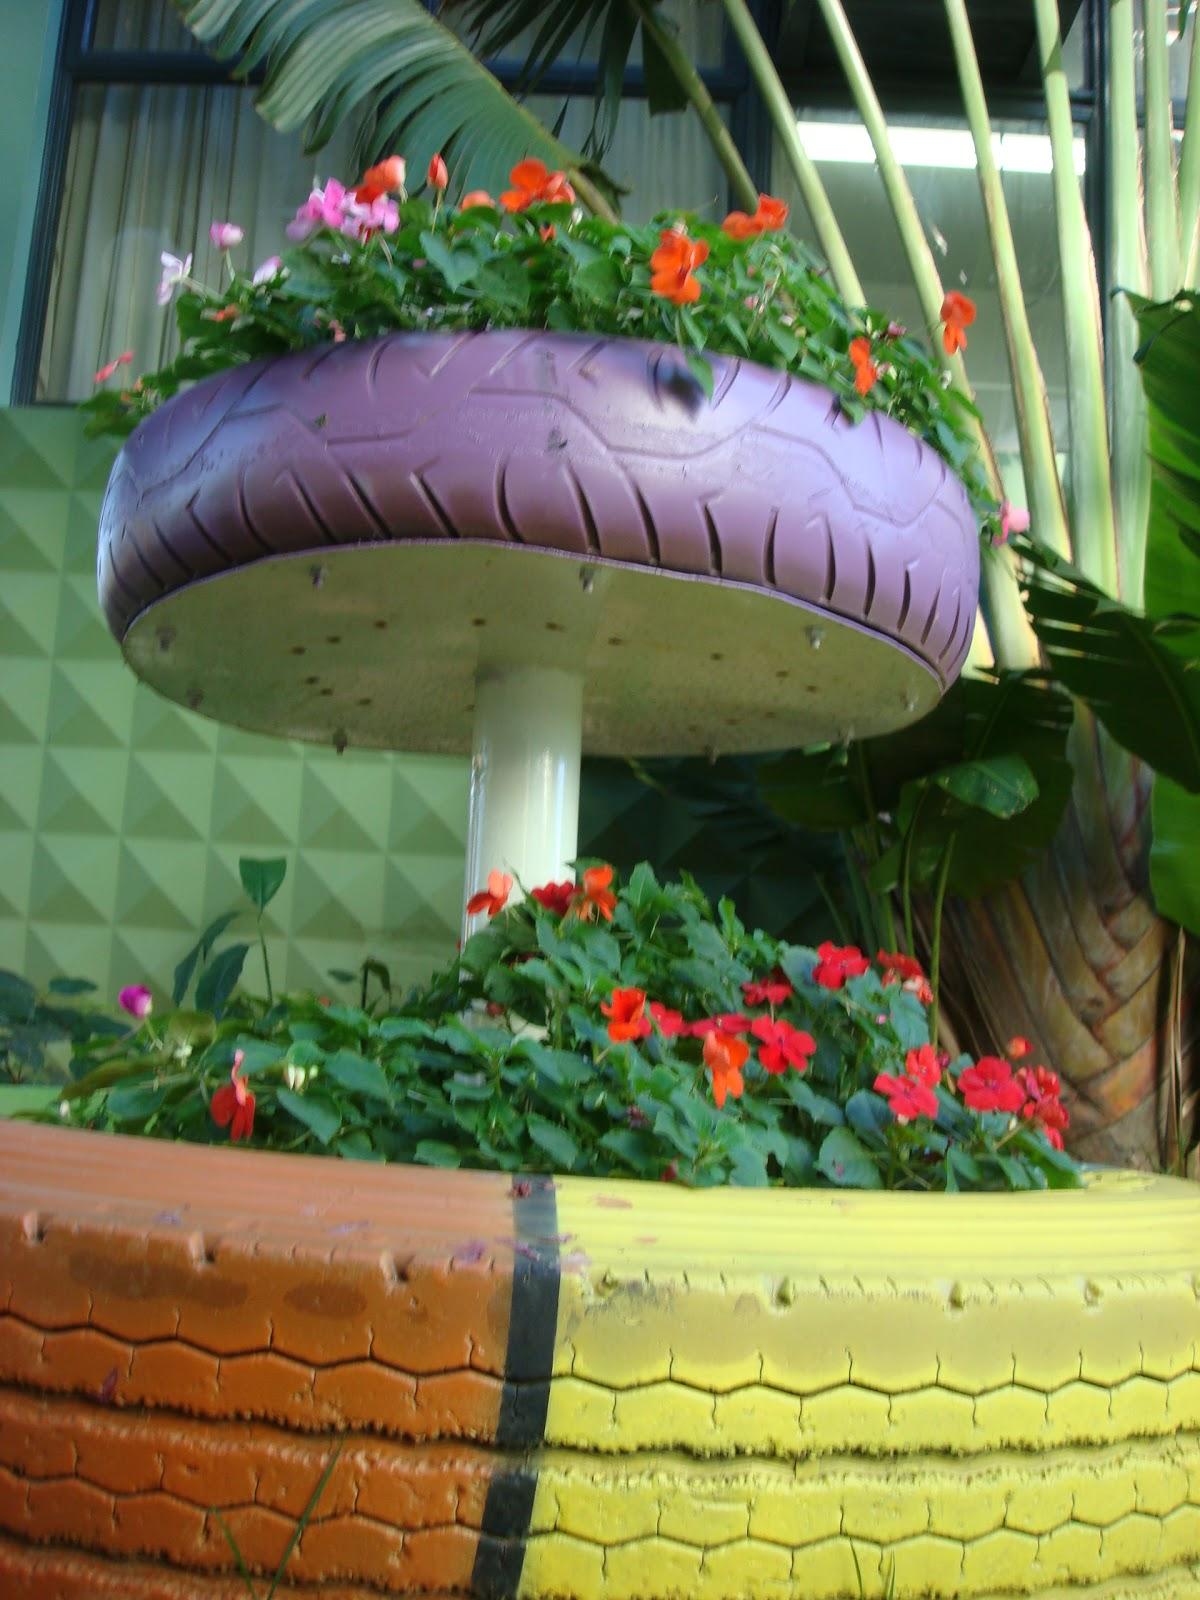 fotos de um jardim lindo : fotos de um jardim lindo:Jardim De Pneus